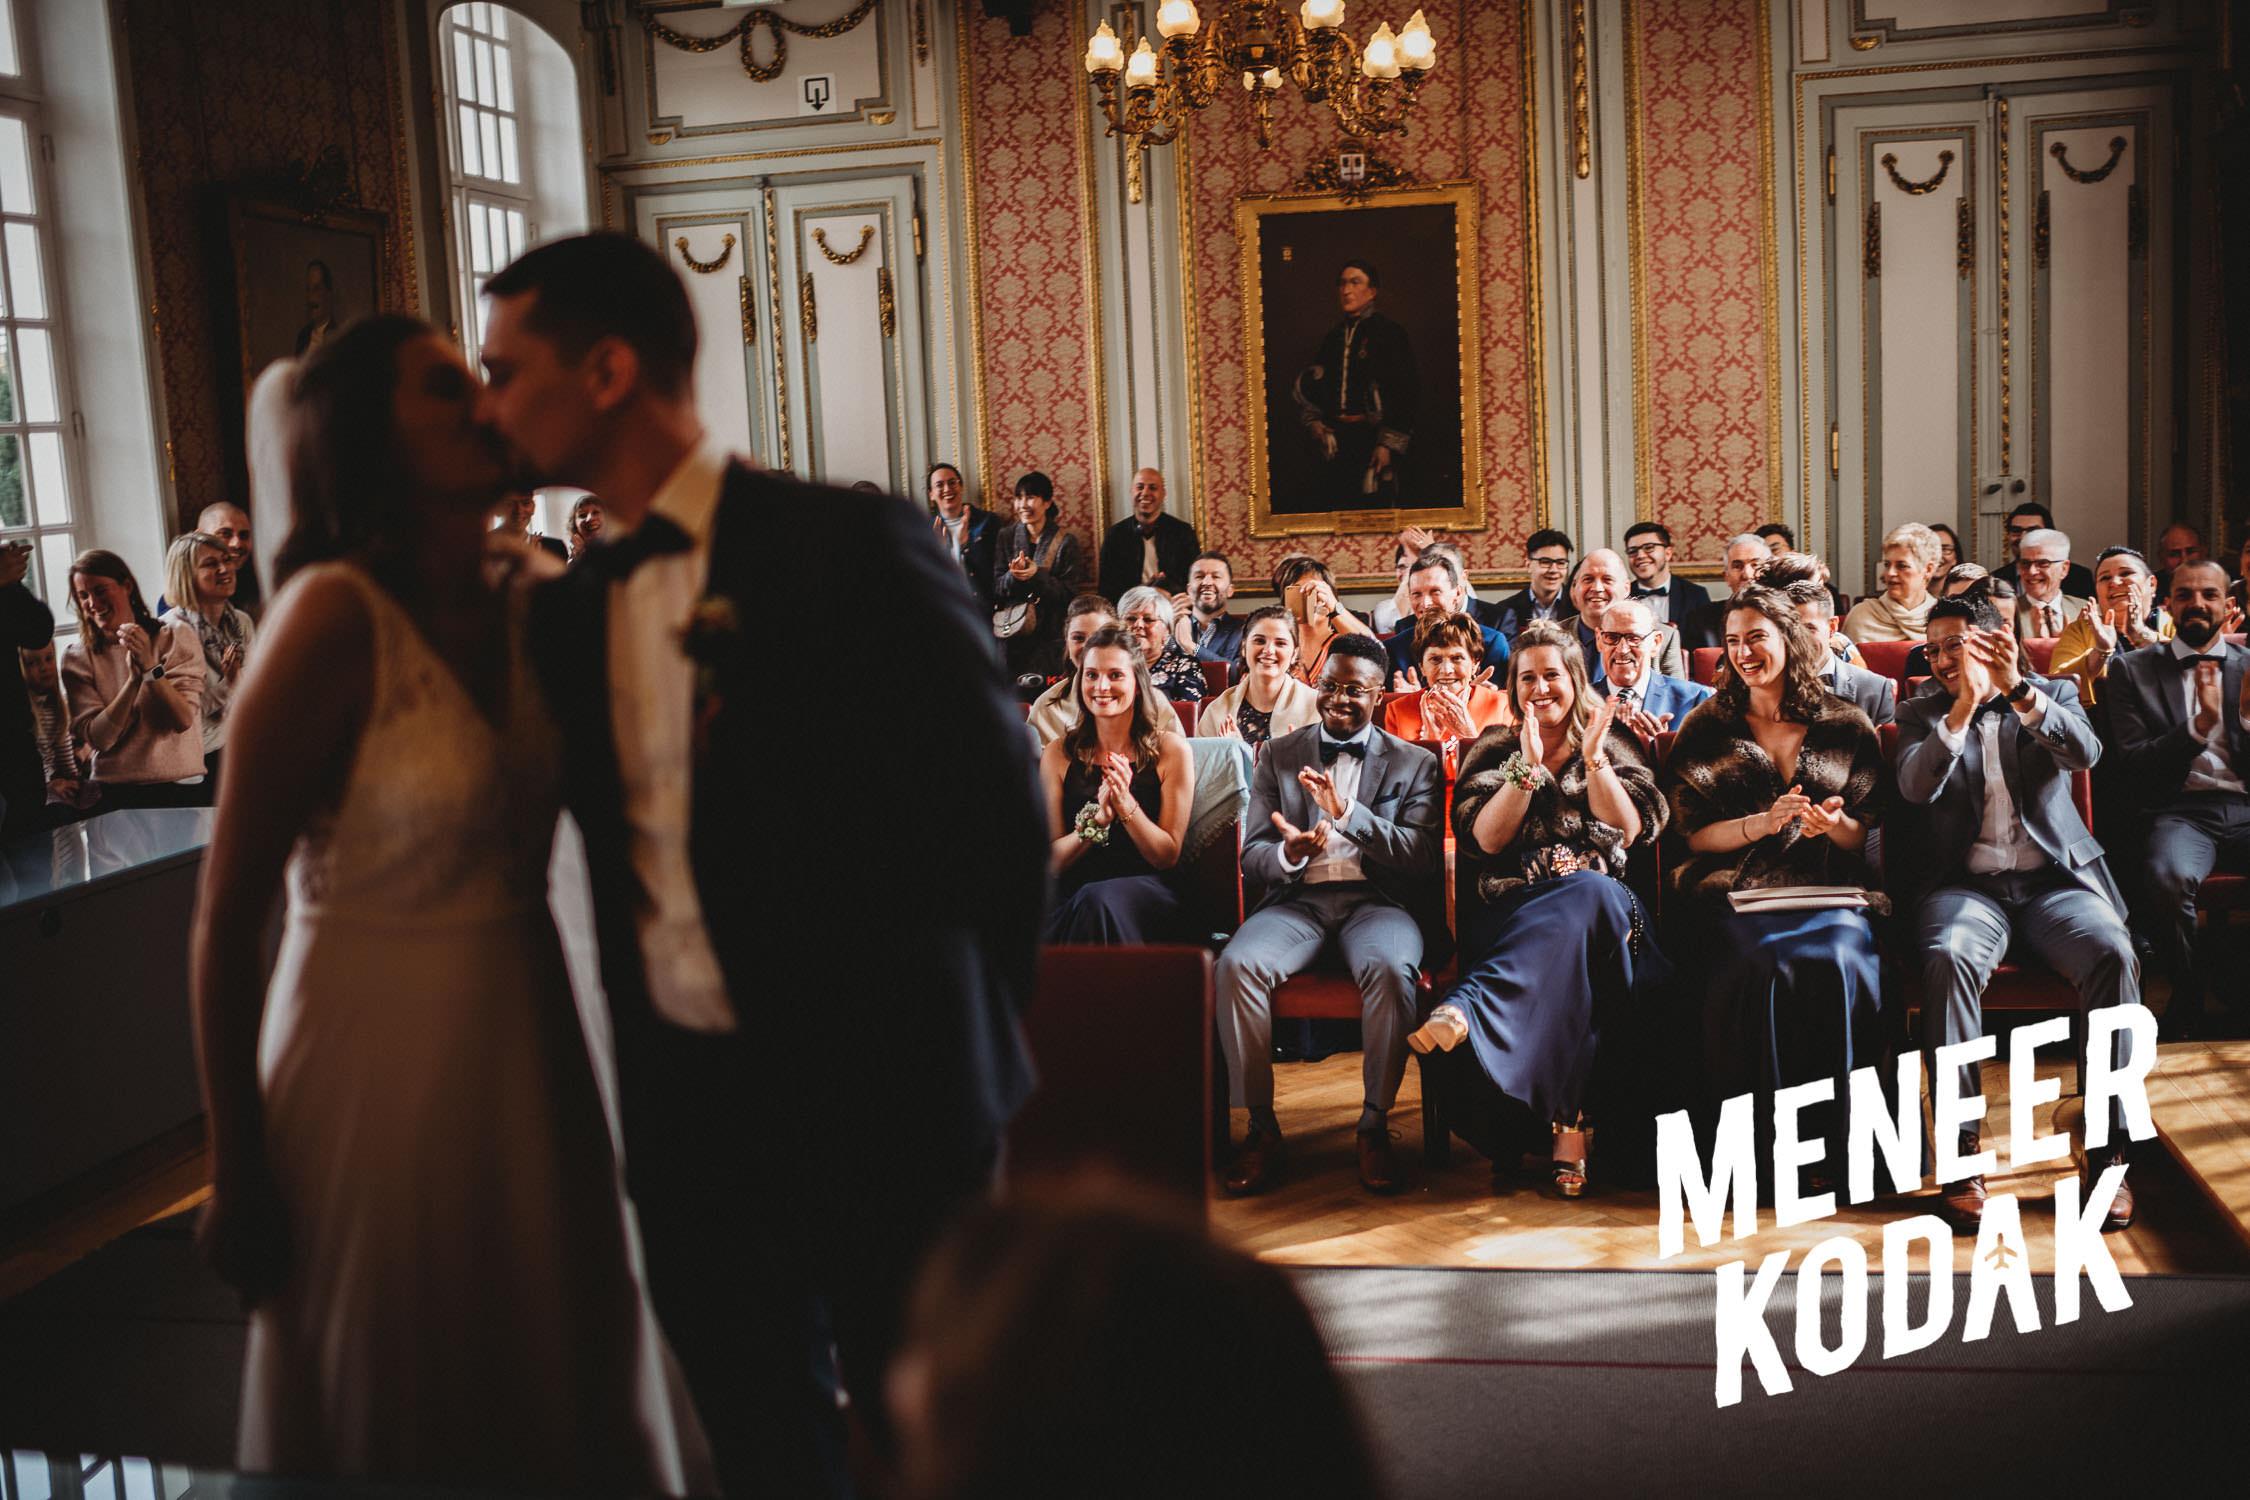 Meneer Kodak - Bruidsfotograaf - Aalst - E&L-063.jpg